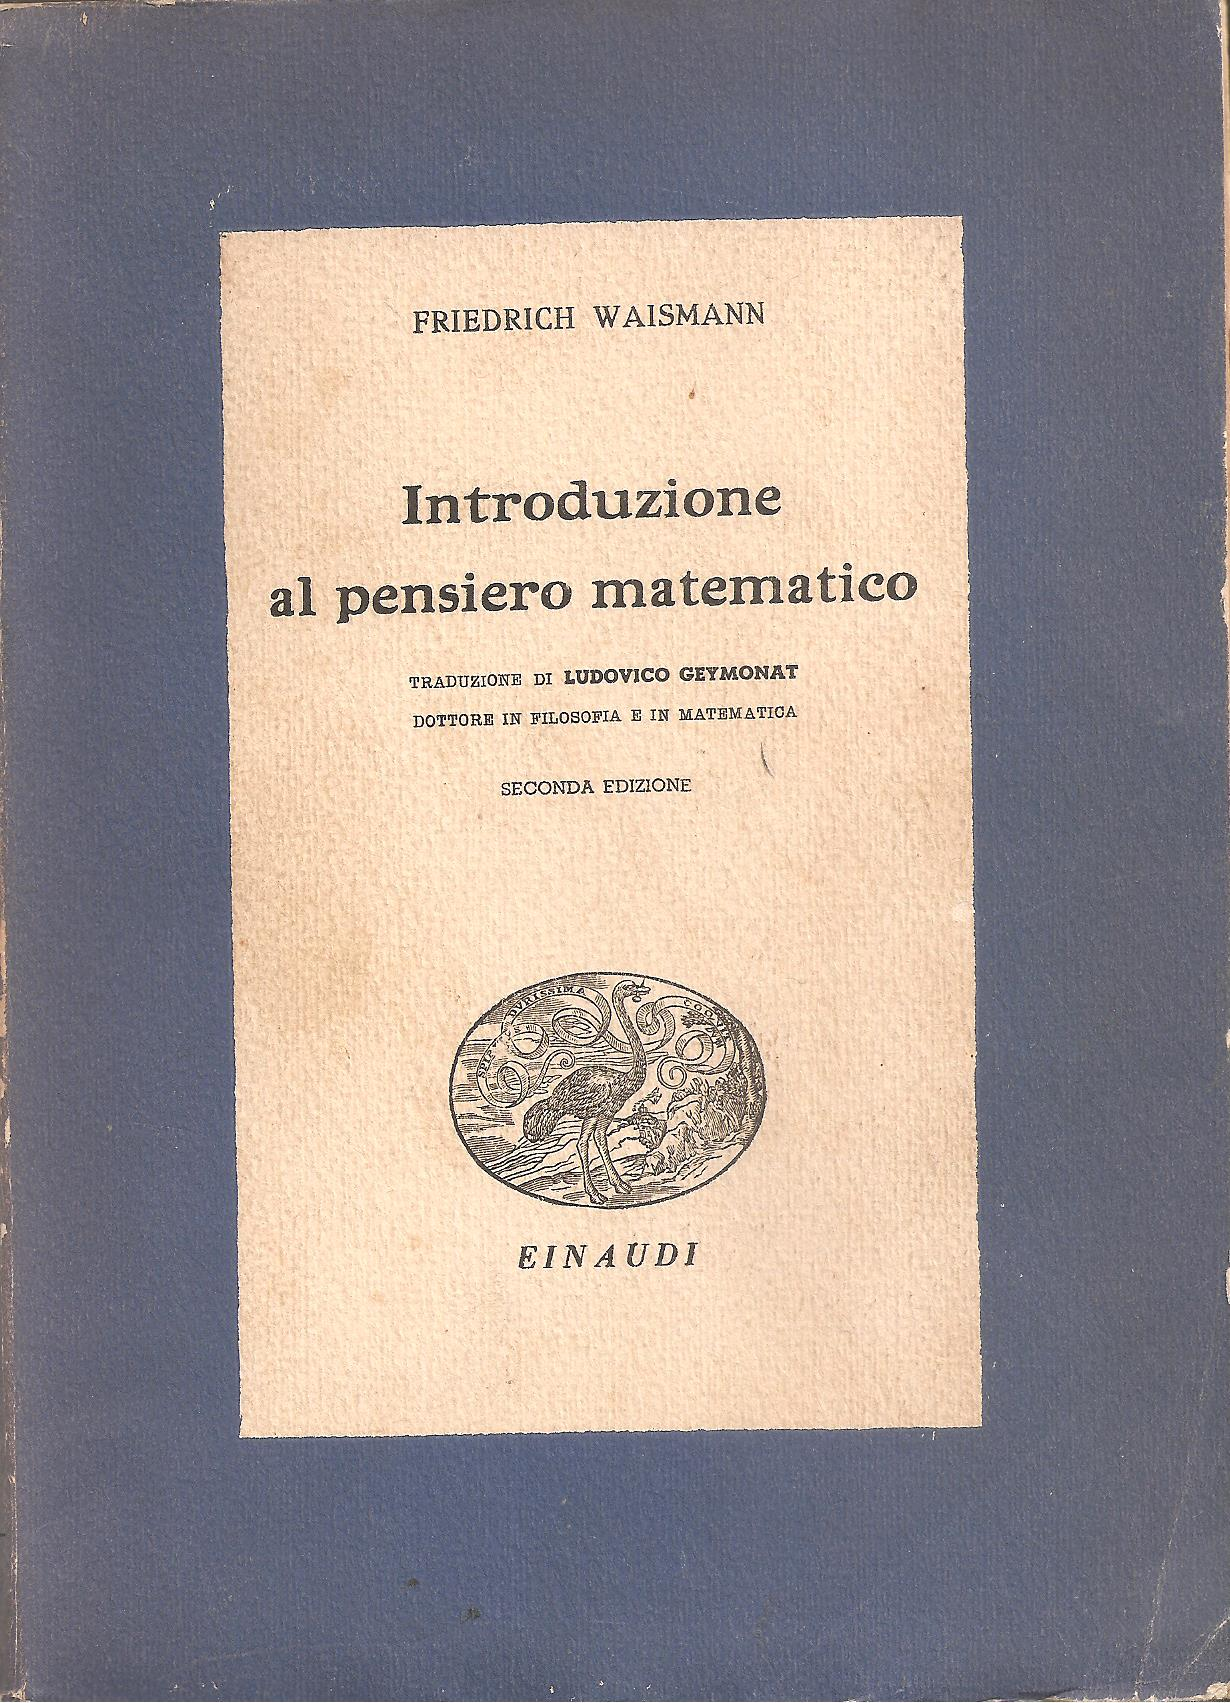 Introduzione al pensiero matematico